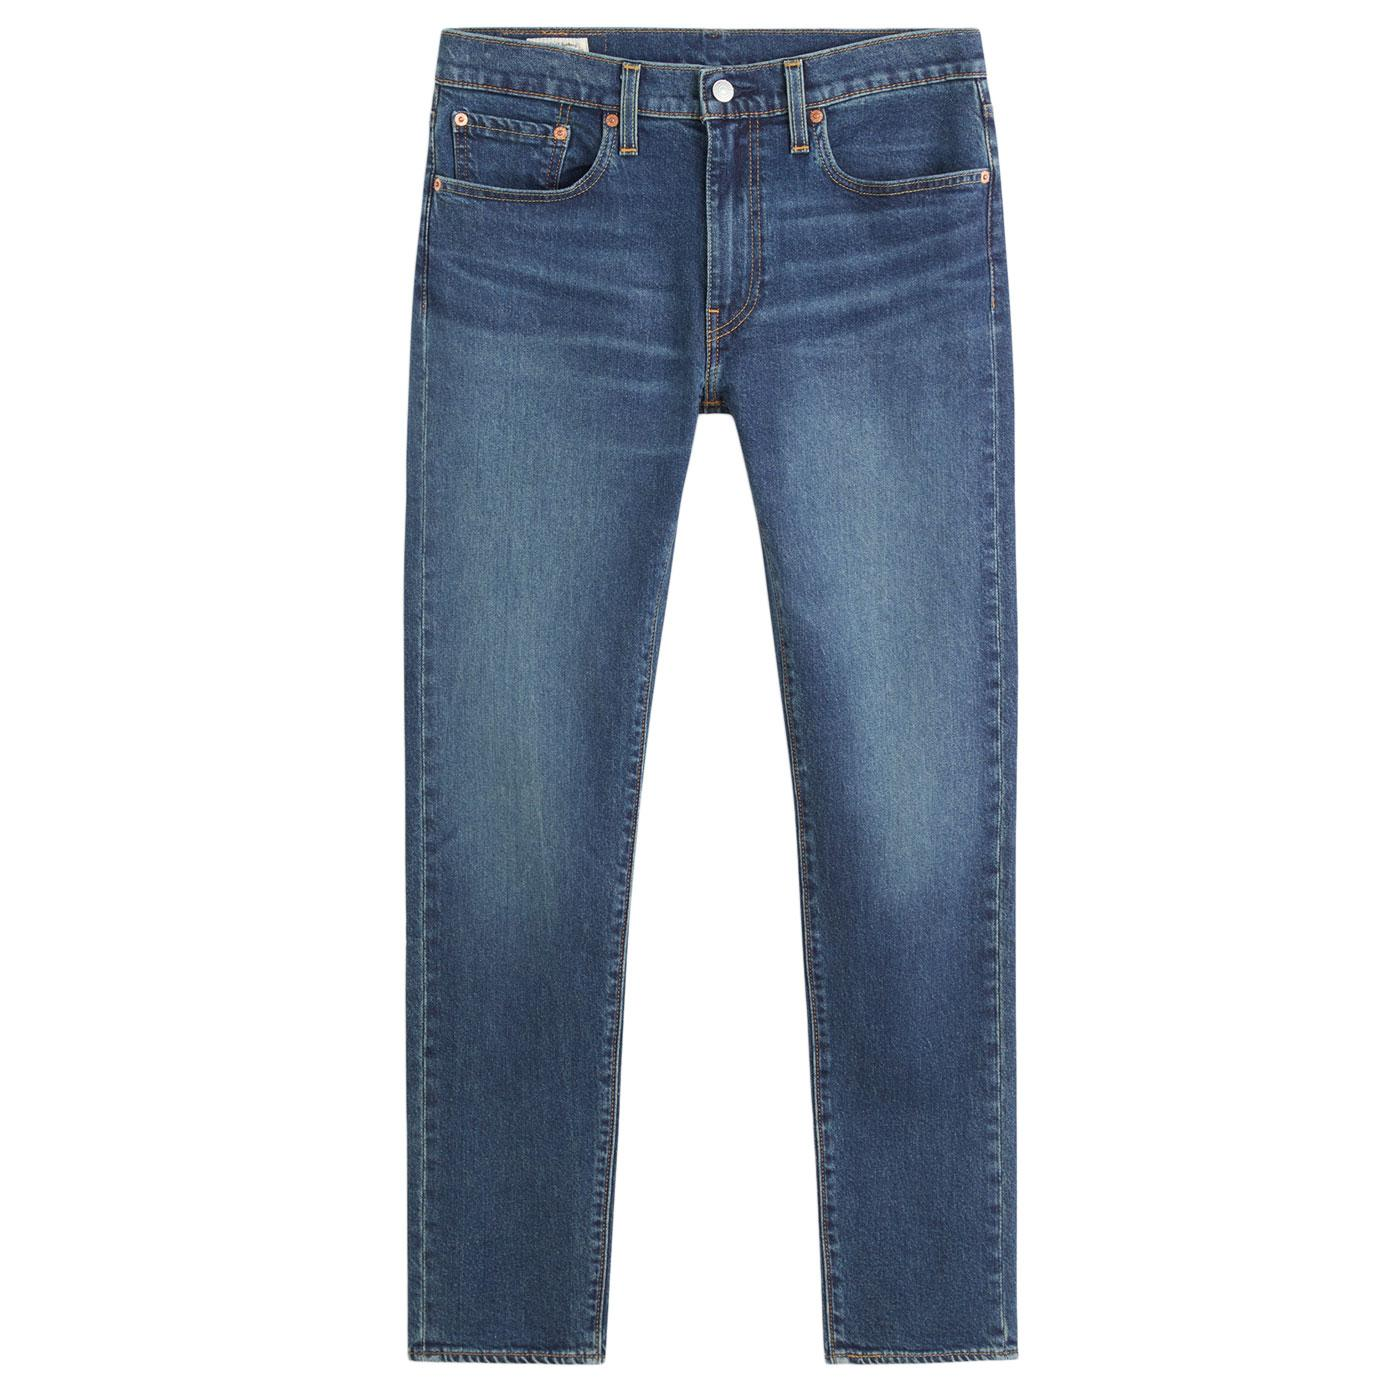 LEVI'S 512 Slim Taper Jeans (Paros Go Adv)